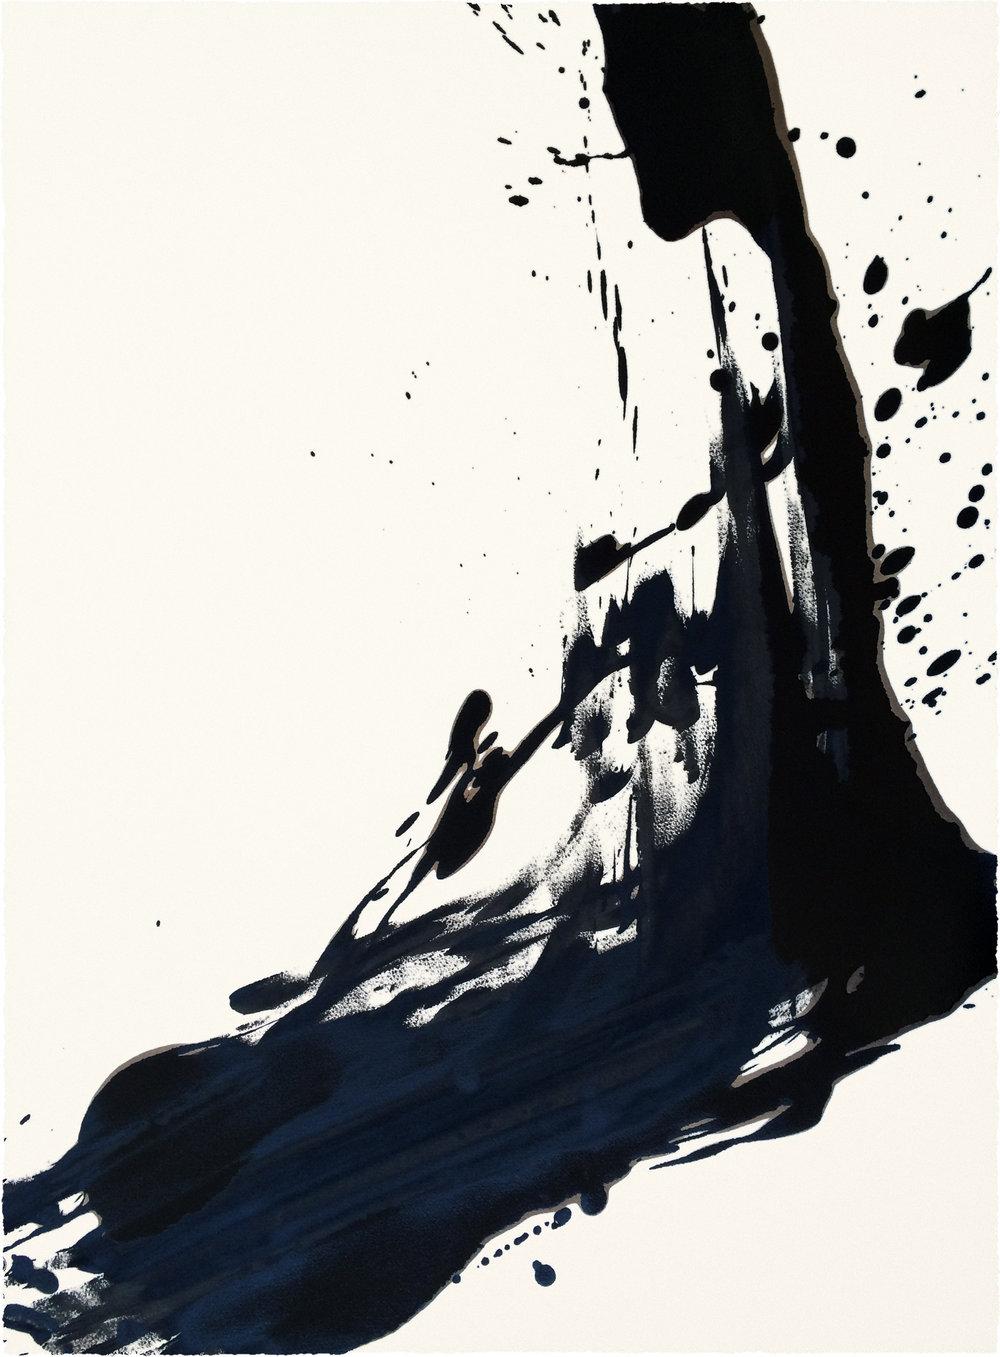 Untitled, Diego Berjon